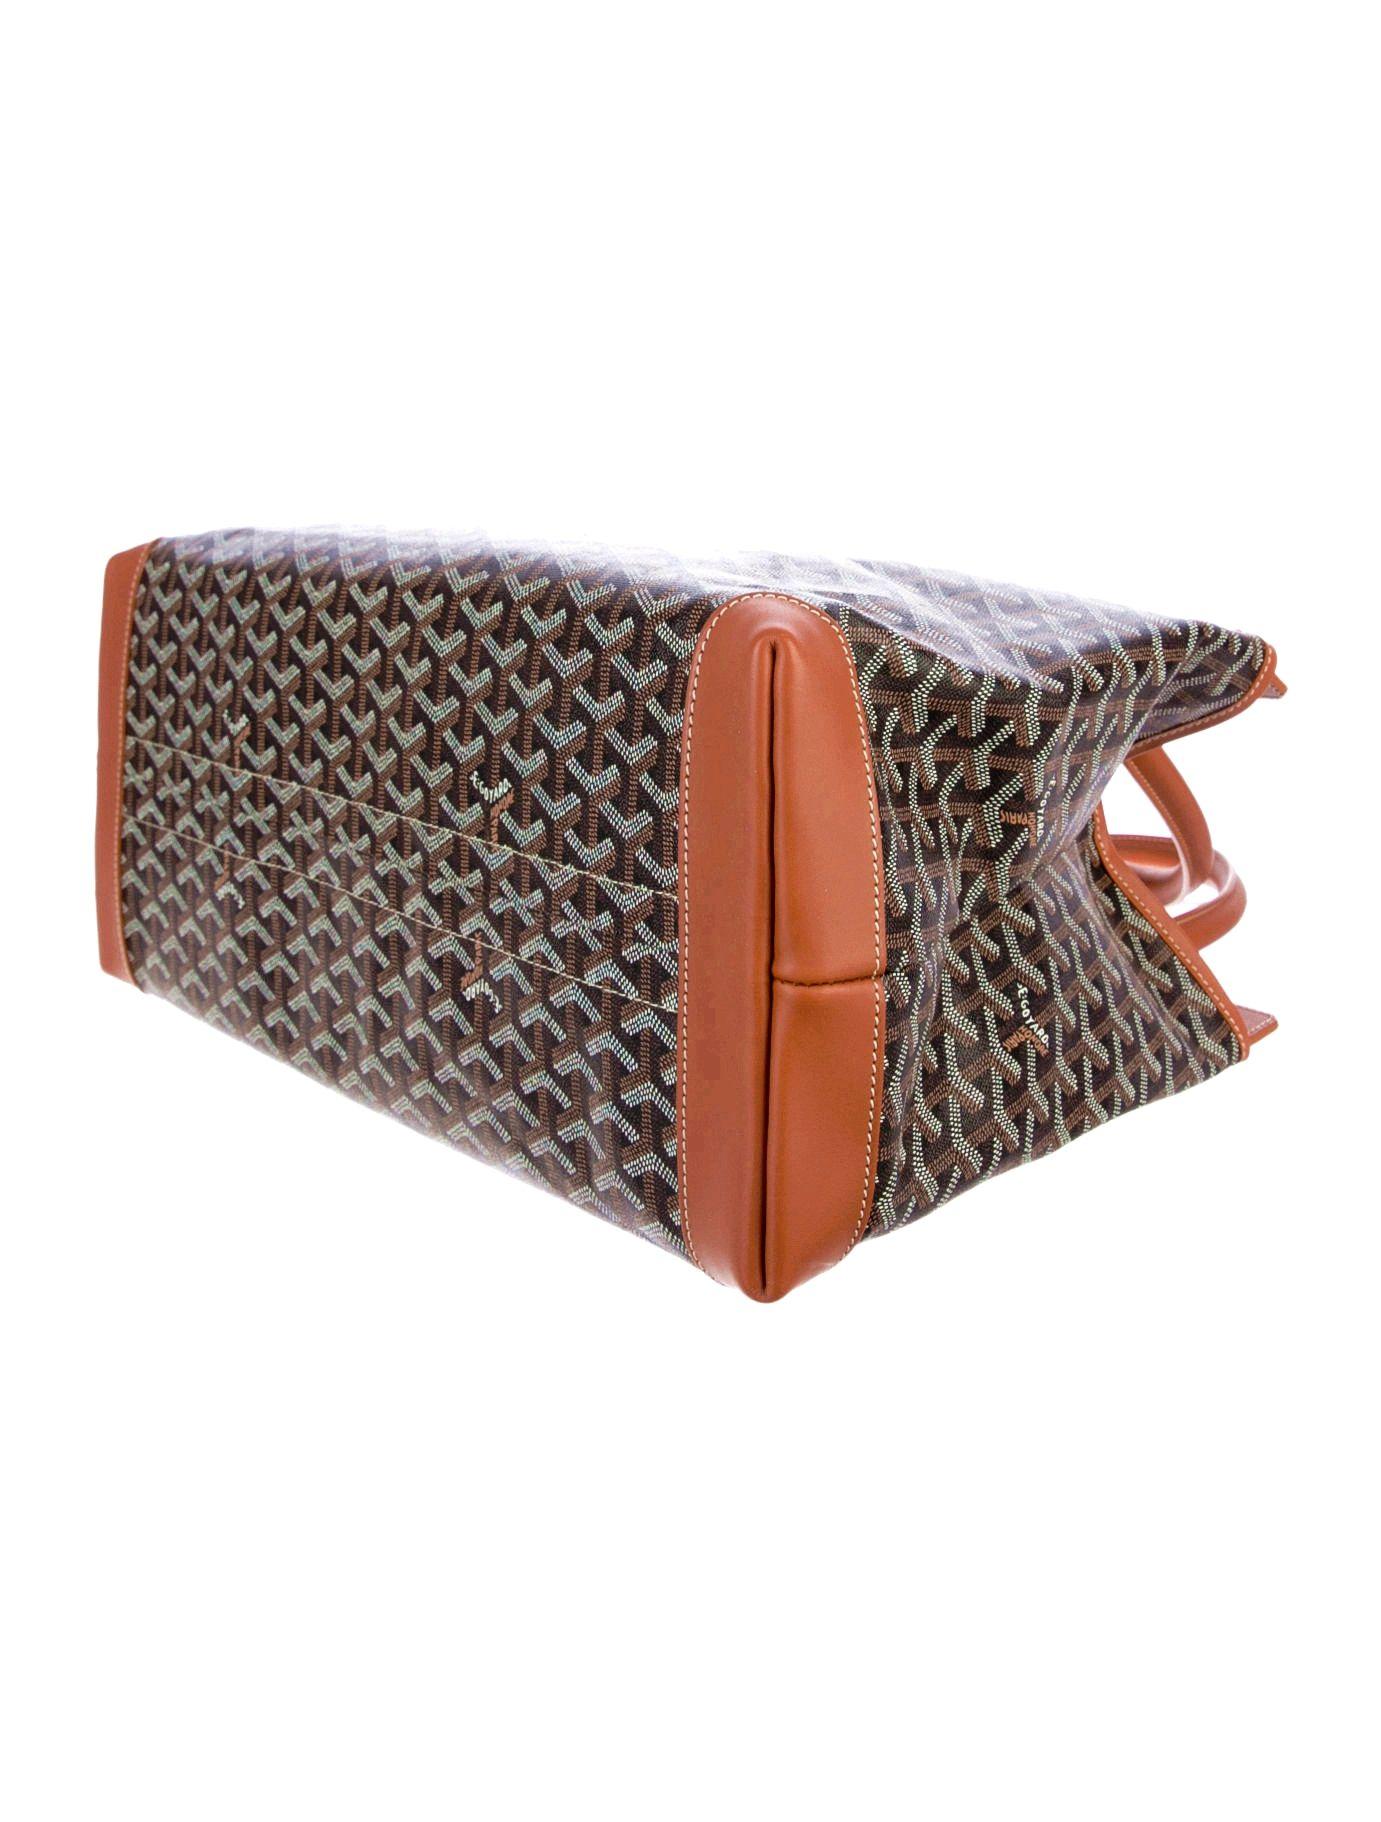 Goyard Bag Handbags